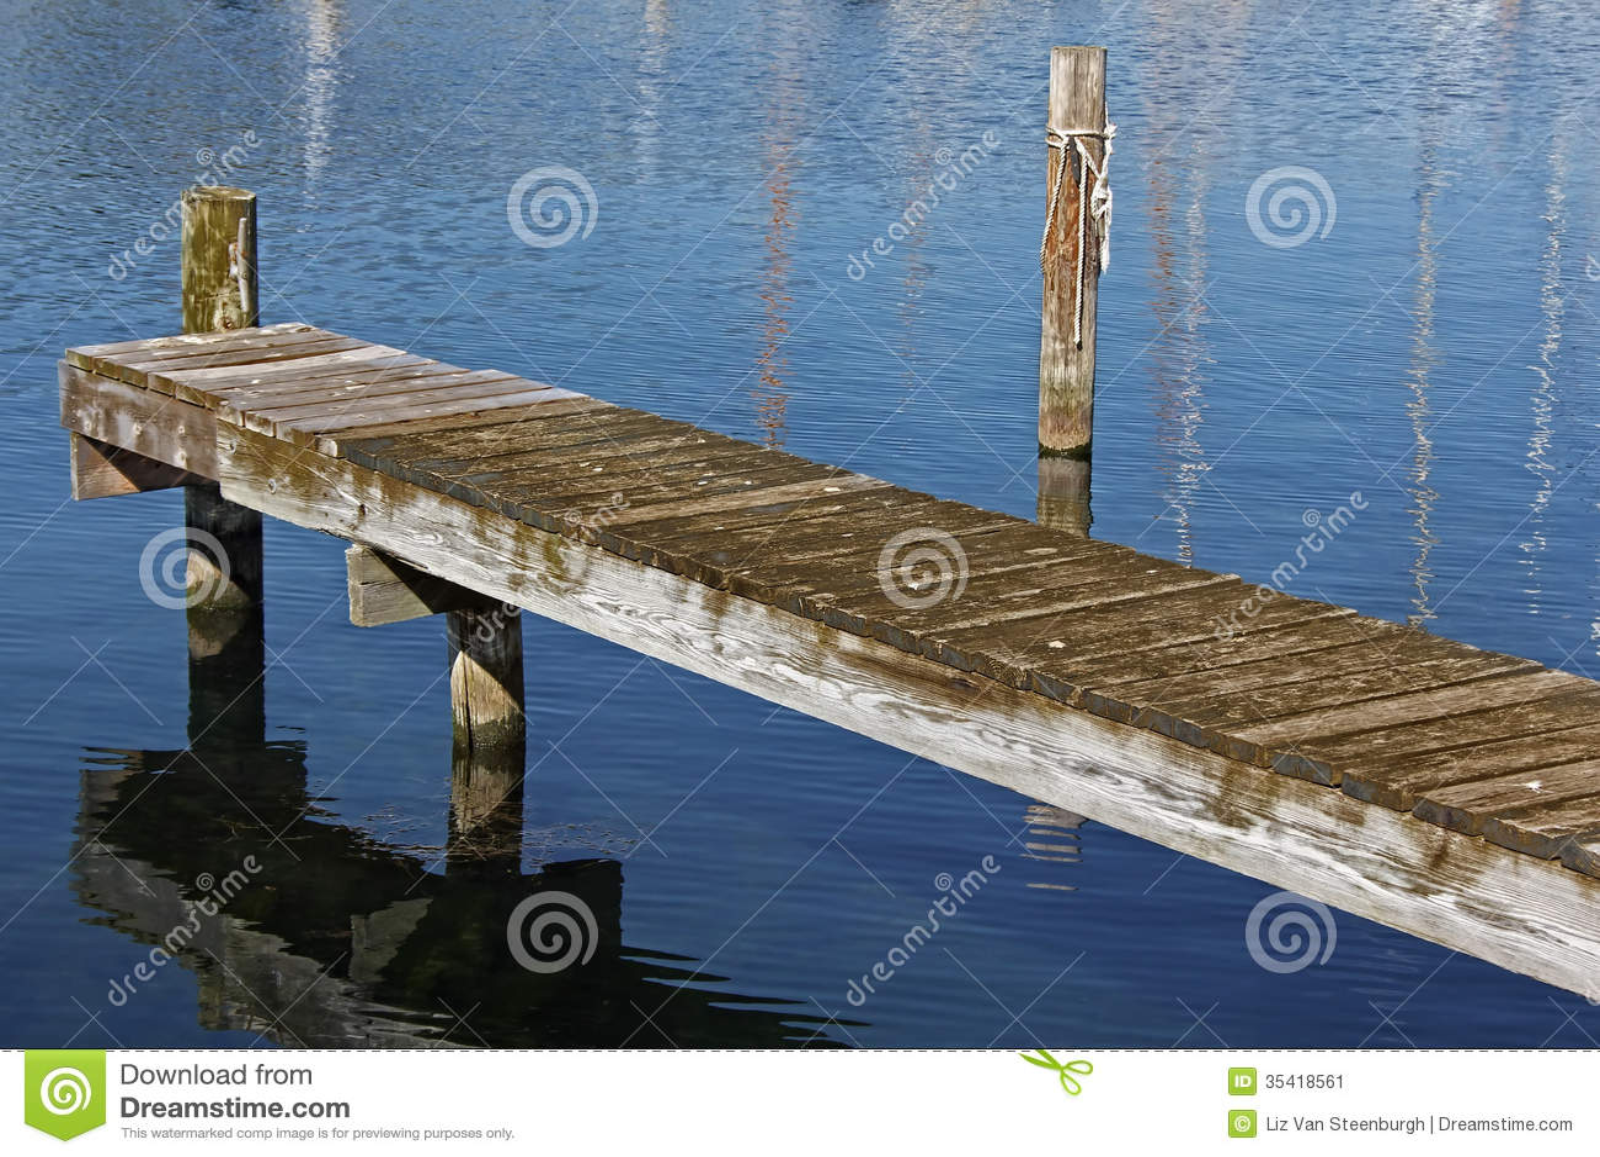 Wooden Dock stock image. Image of nobody, wooden, docks - 35418561